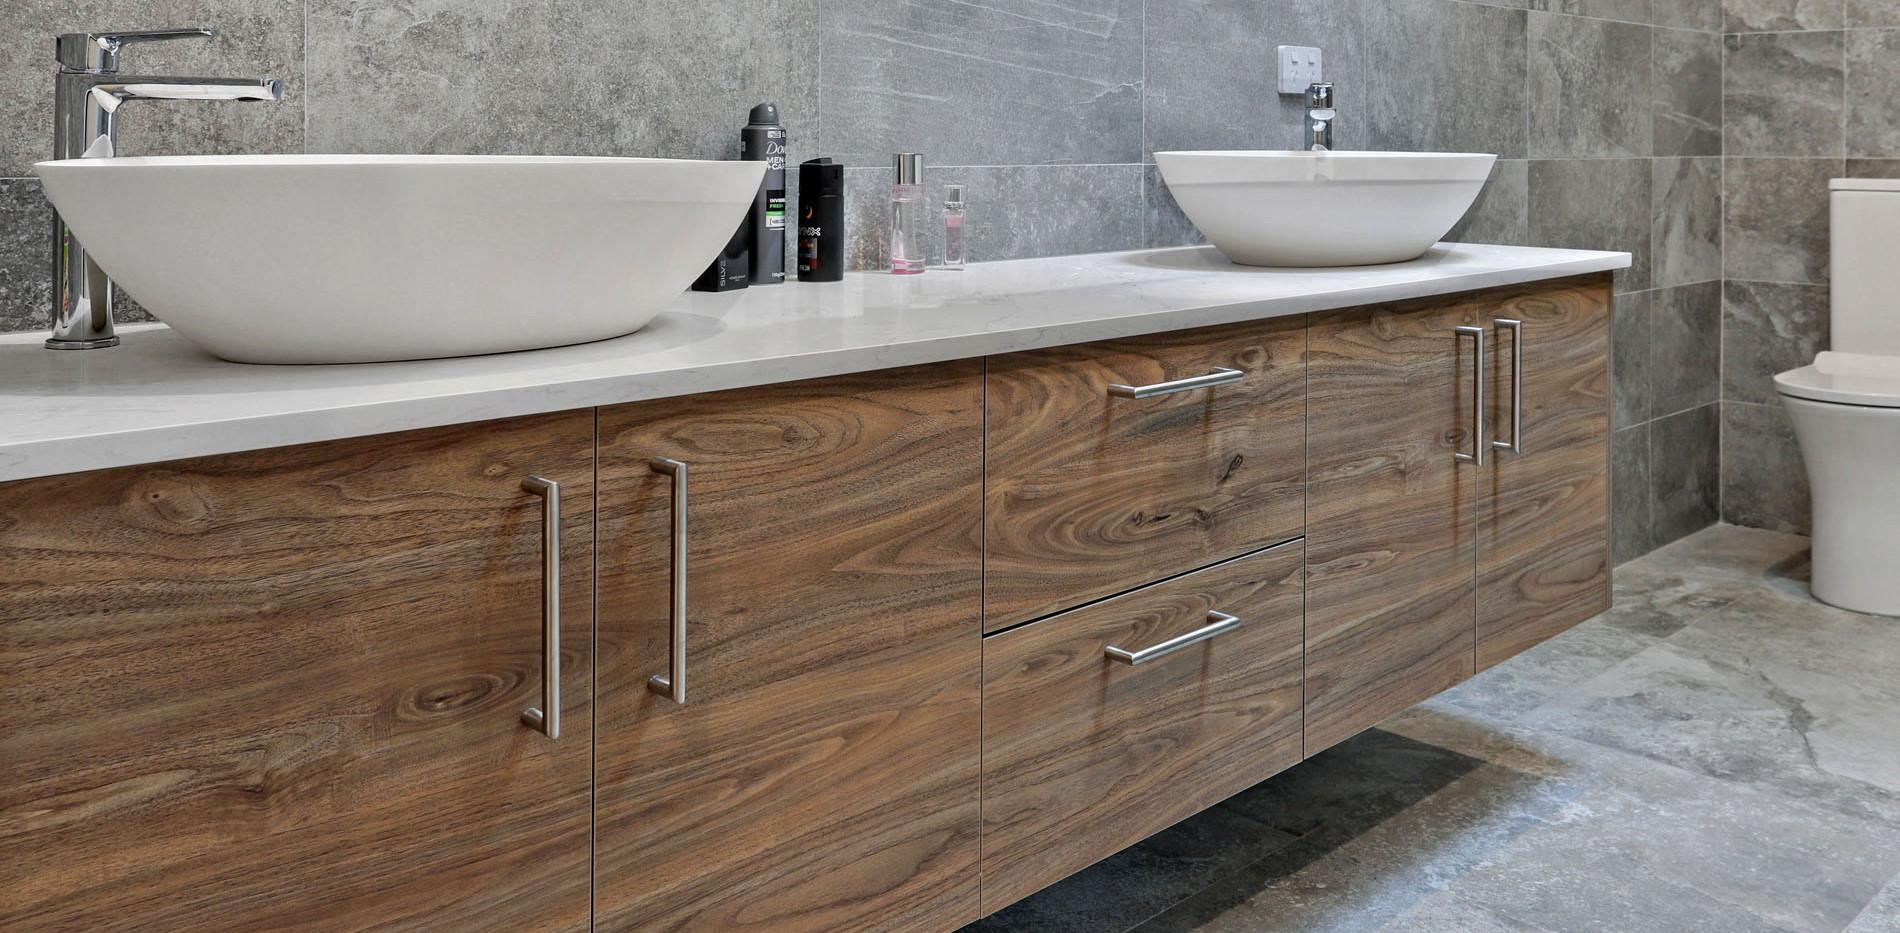 Hawkesbury bathrooms and Kitchens (9)